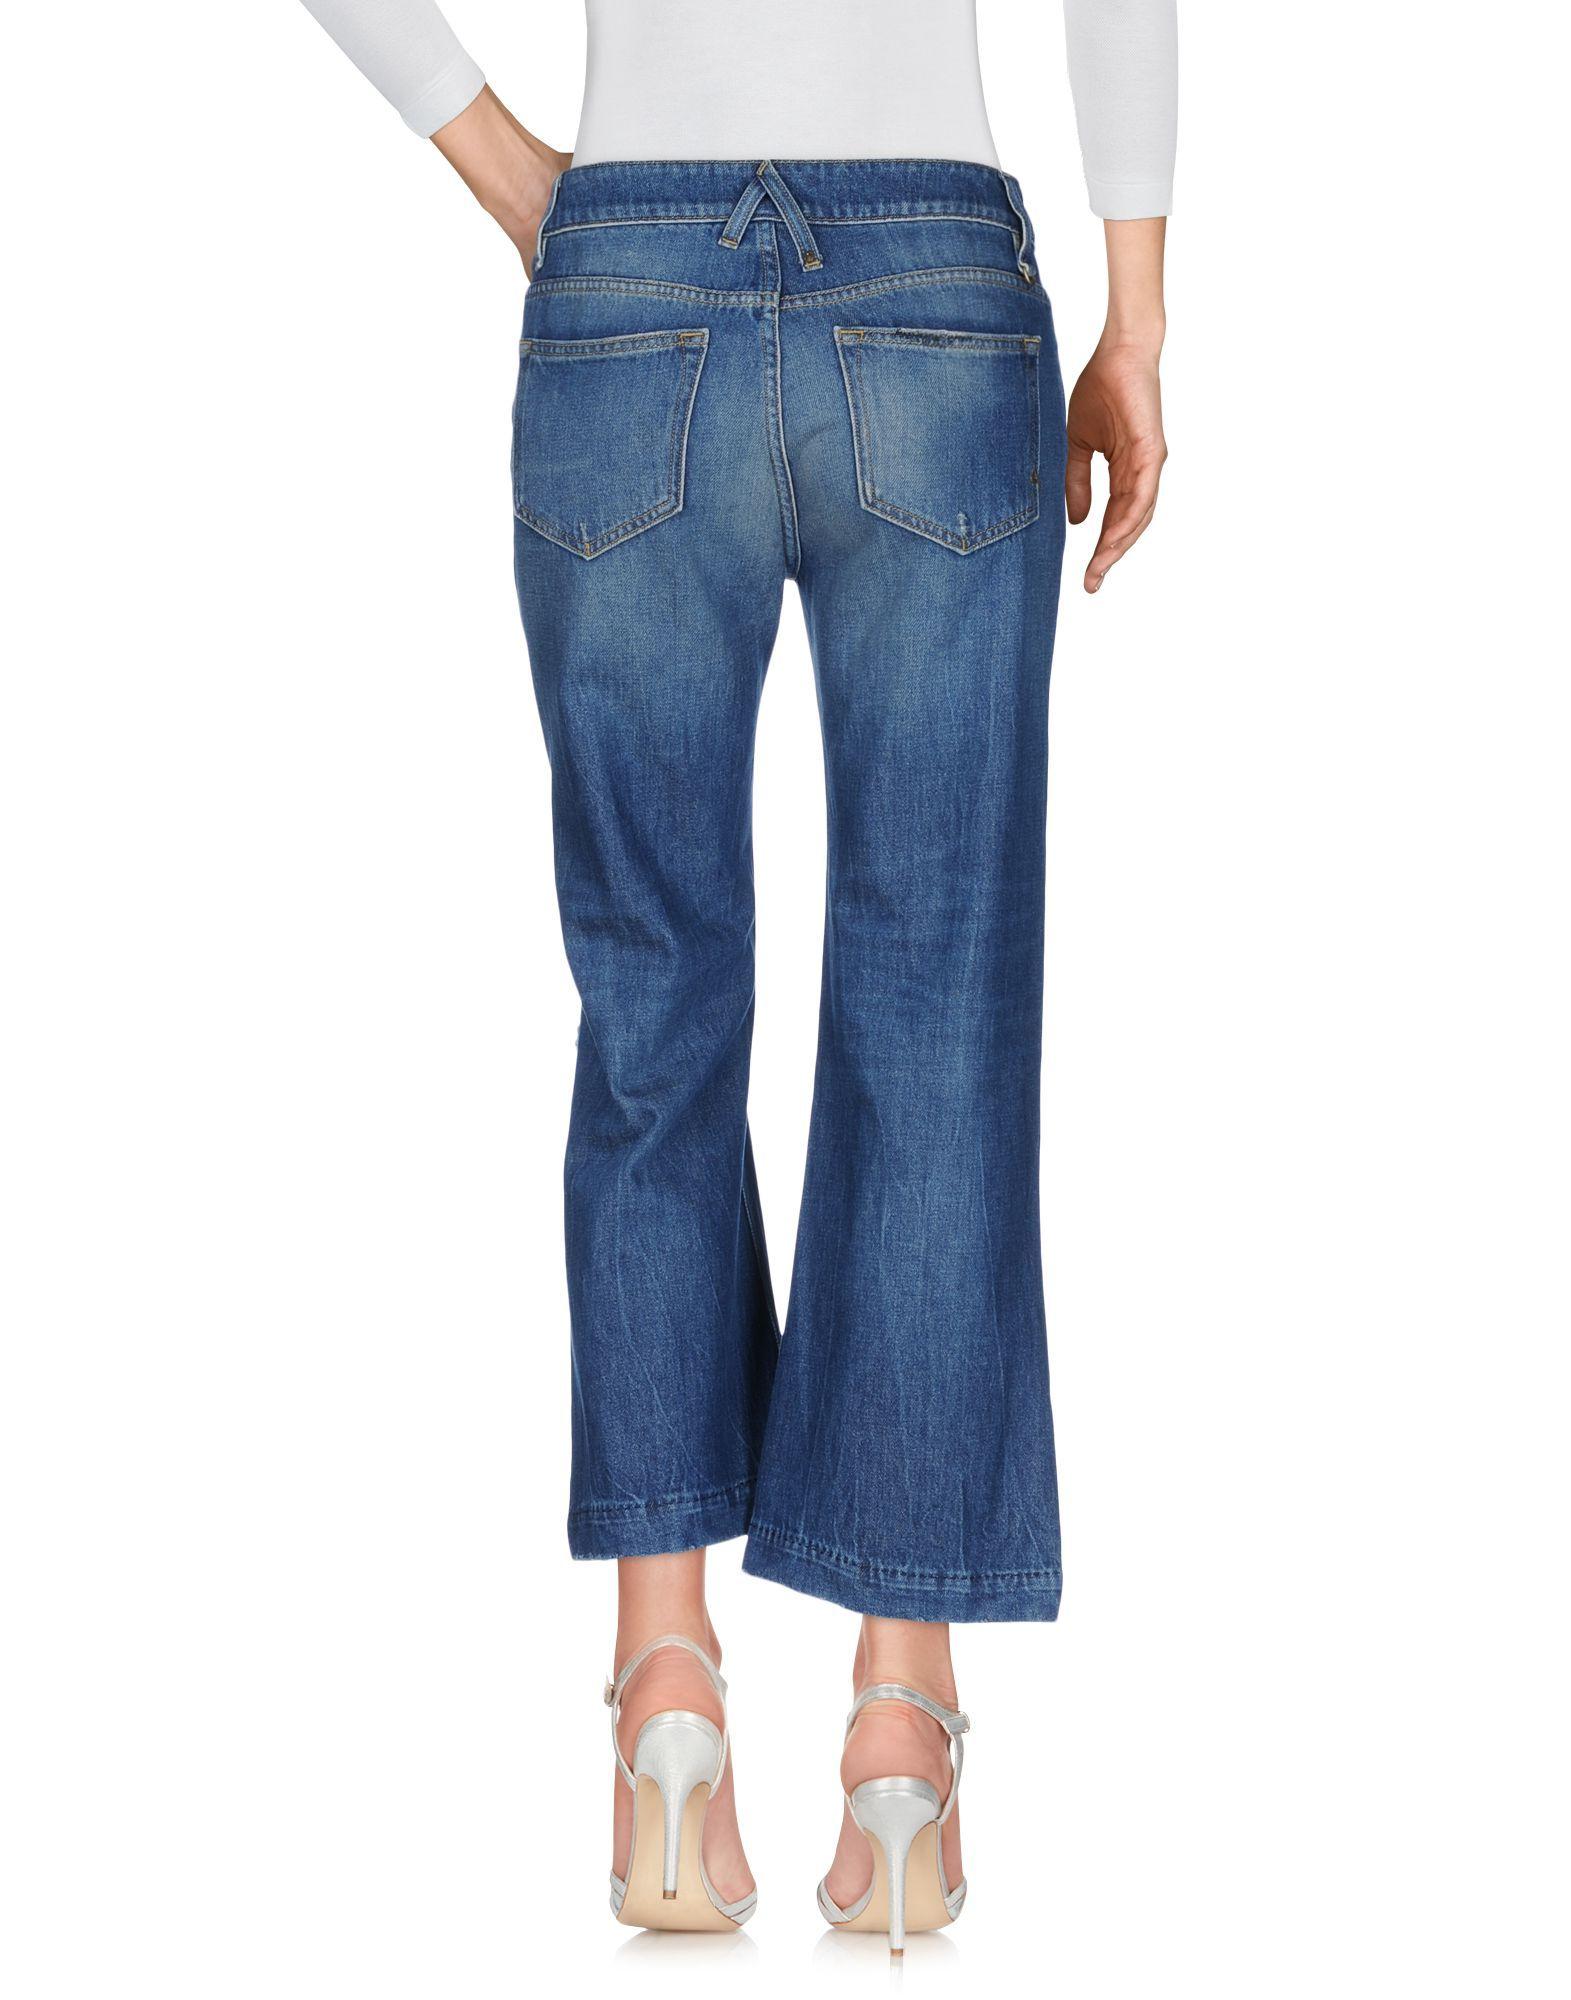 Denim Women's Cycle Blue Cotton